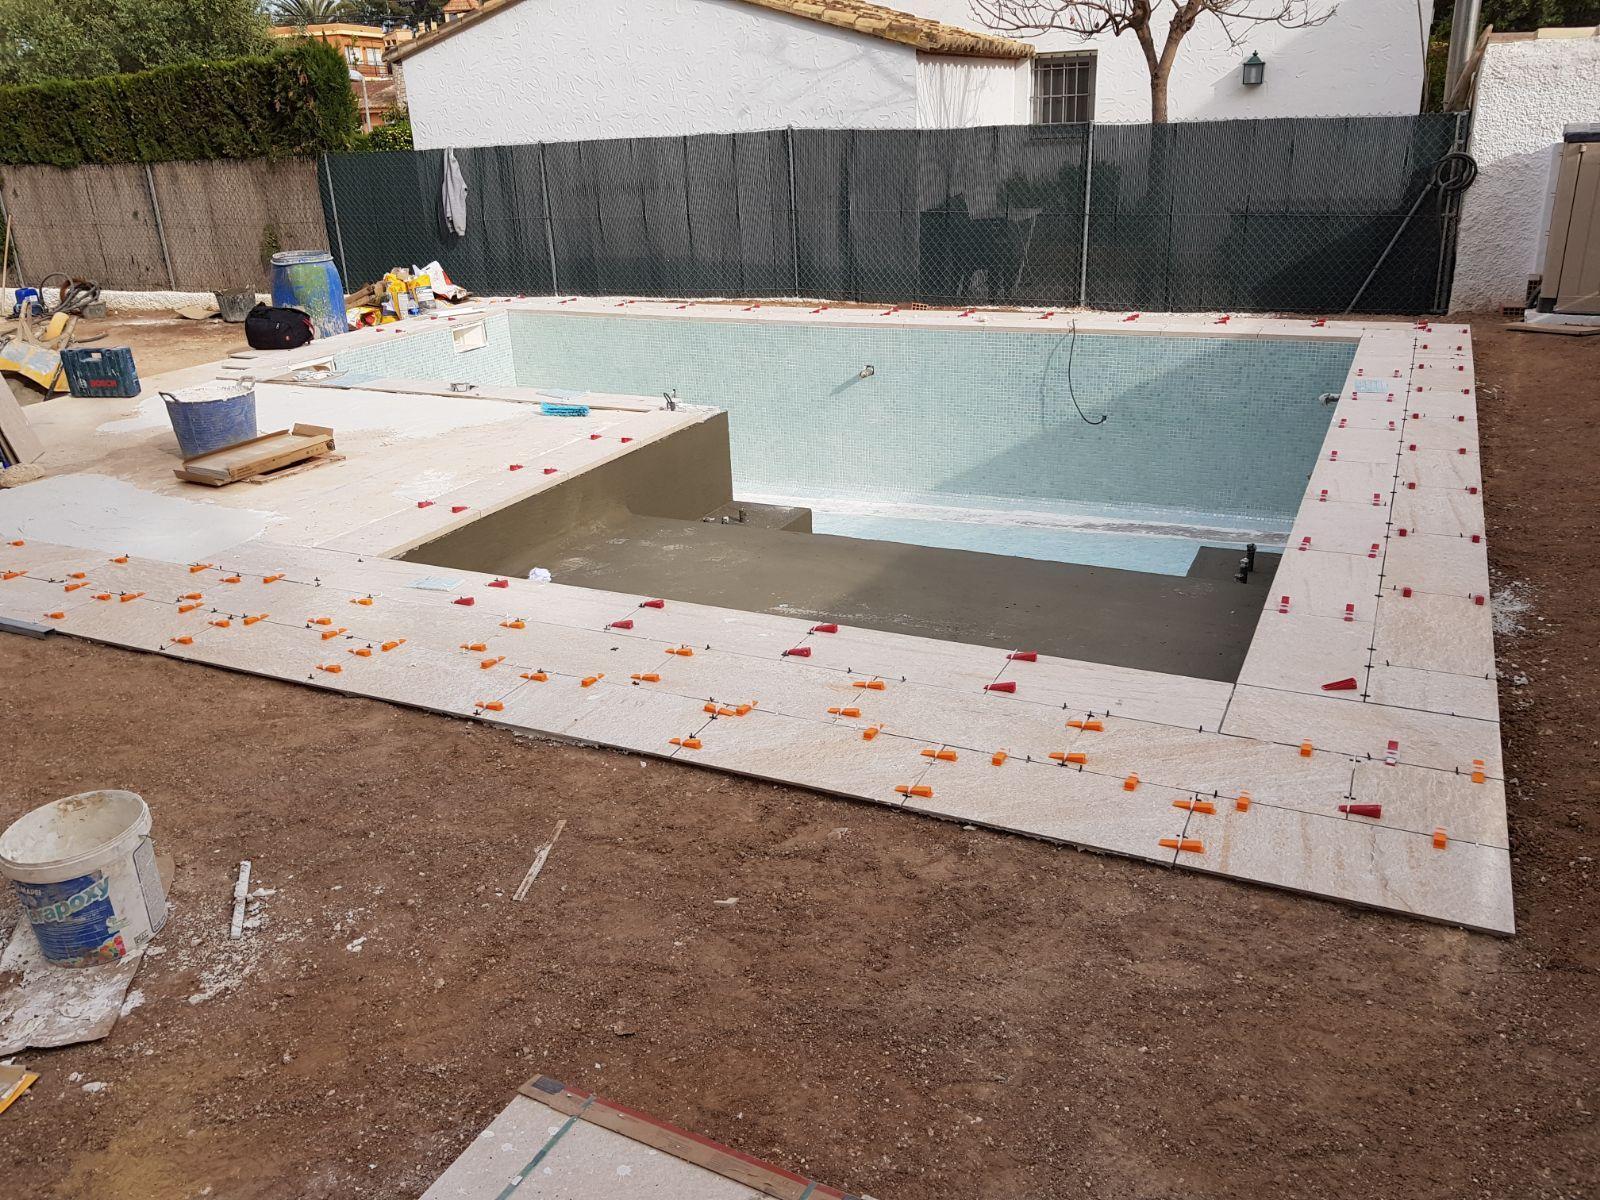 reforma_piscina_1_13